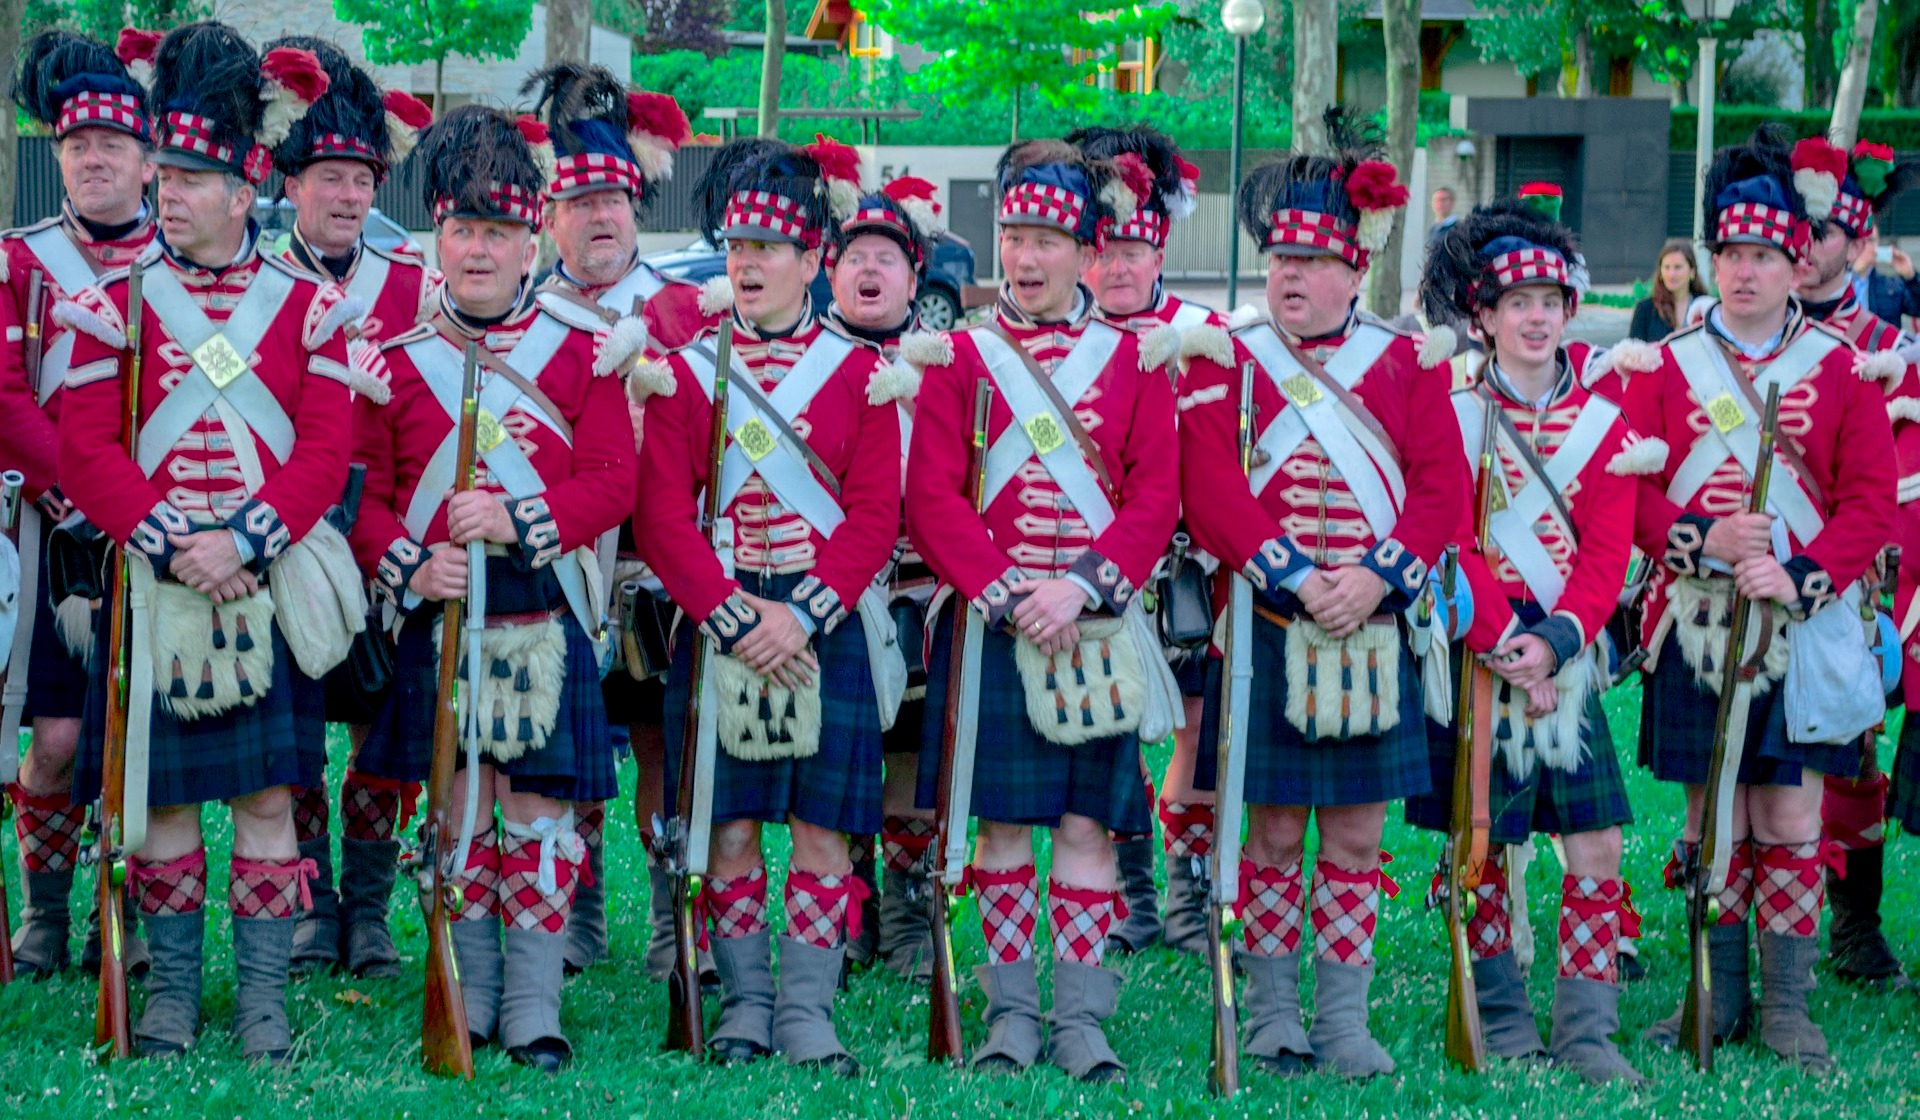 Scottish Highlands 1500-1800